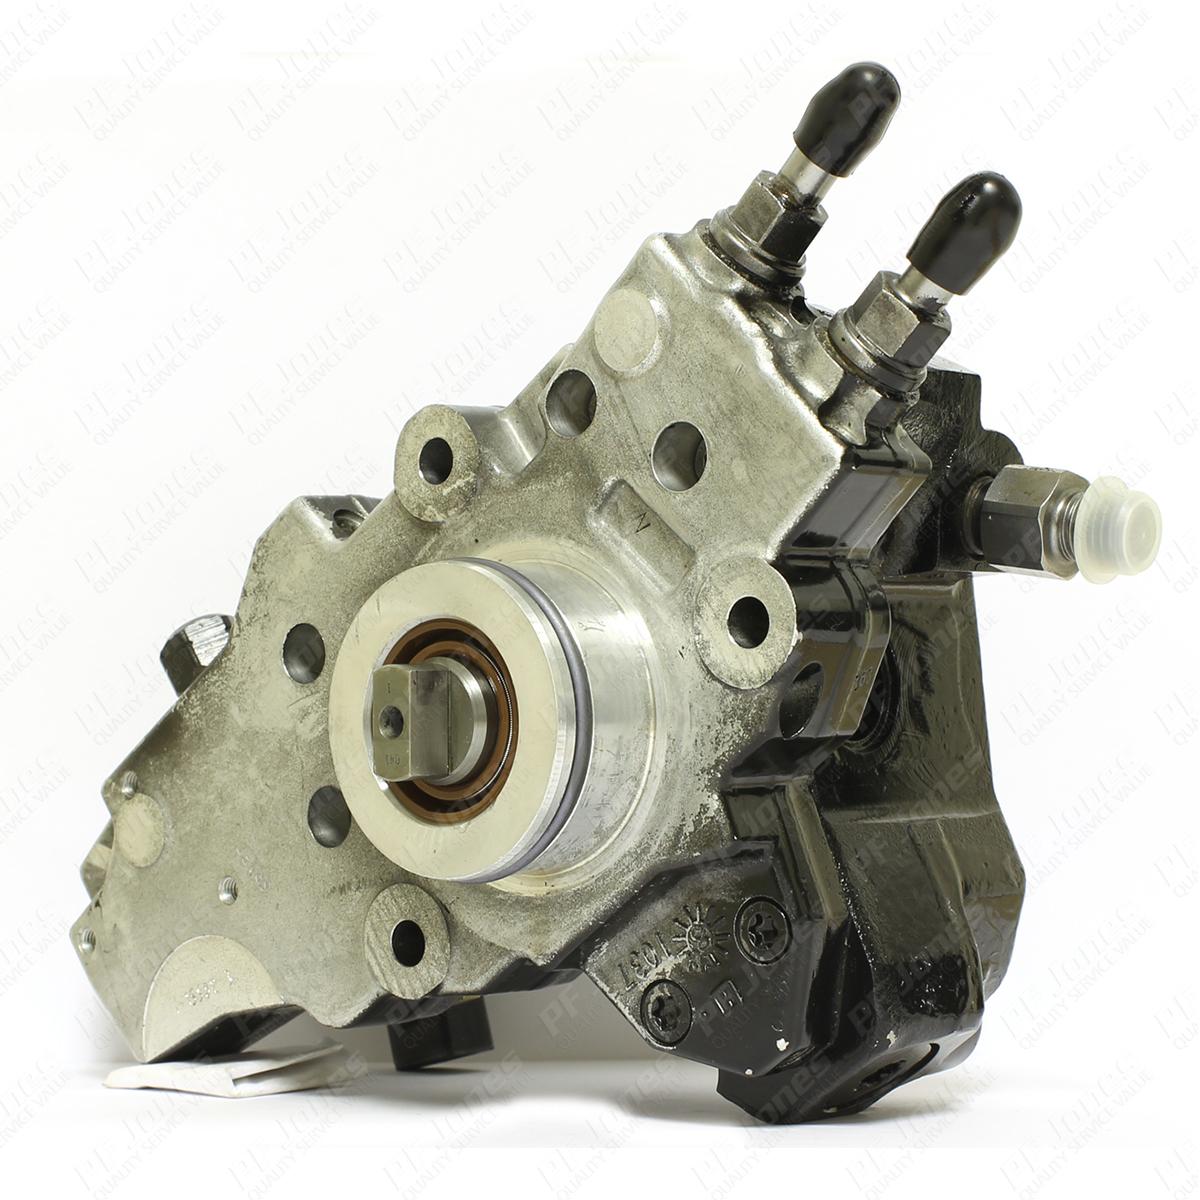 Mercedes-Benz Vito 2.1 CDi 2003-2010 Reconditioned Bosch Diesel Fuel Pump 0445010143